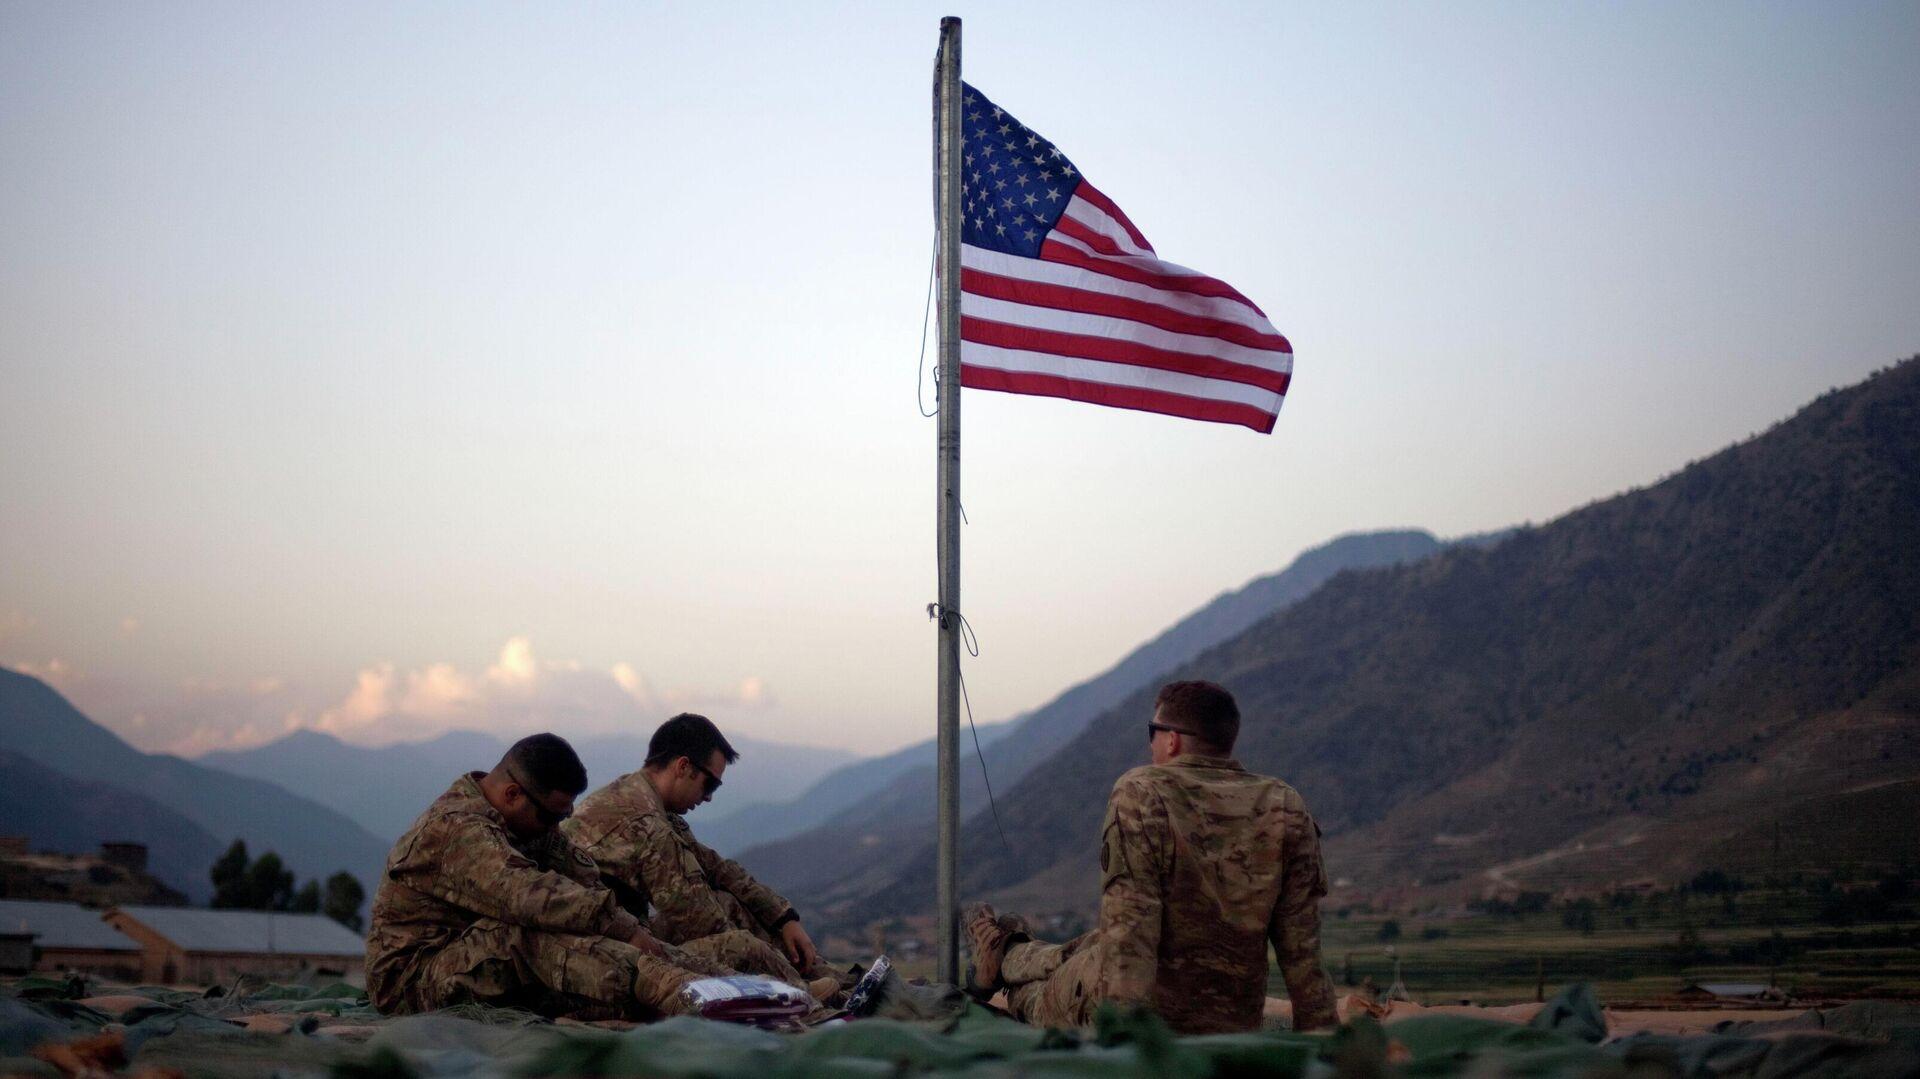 Militares de EEUU en Afganistán - Sputnik Mundo, 1920, 27.09.2021